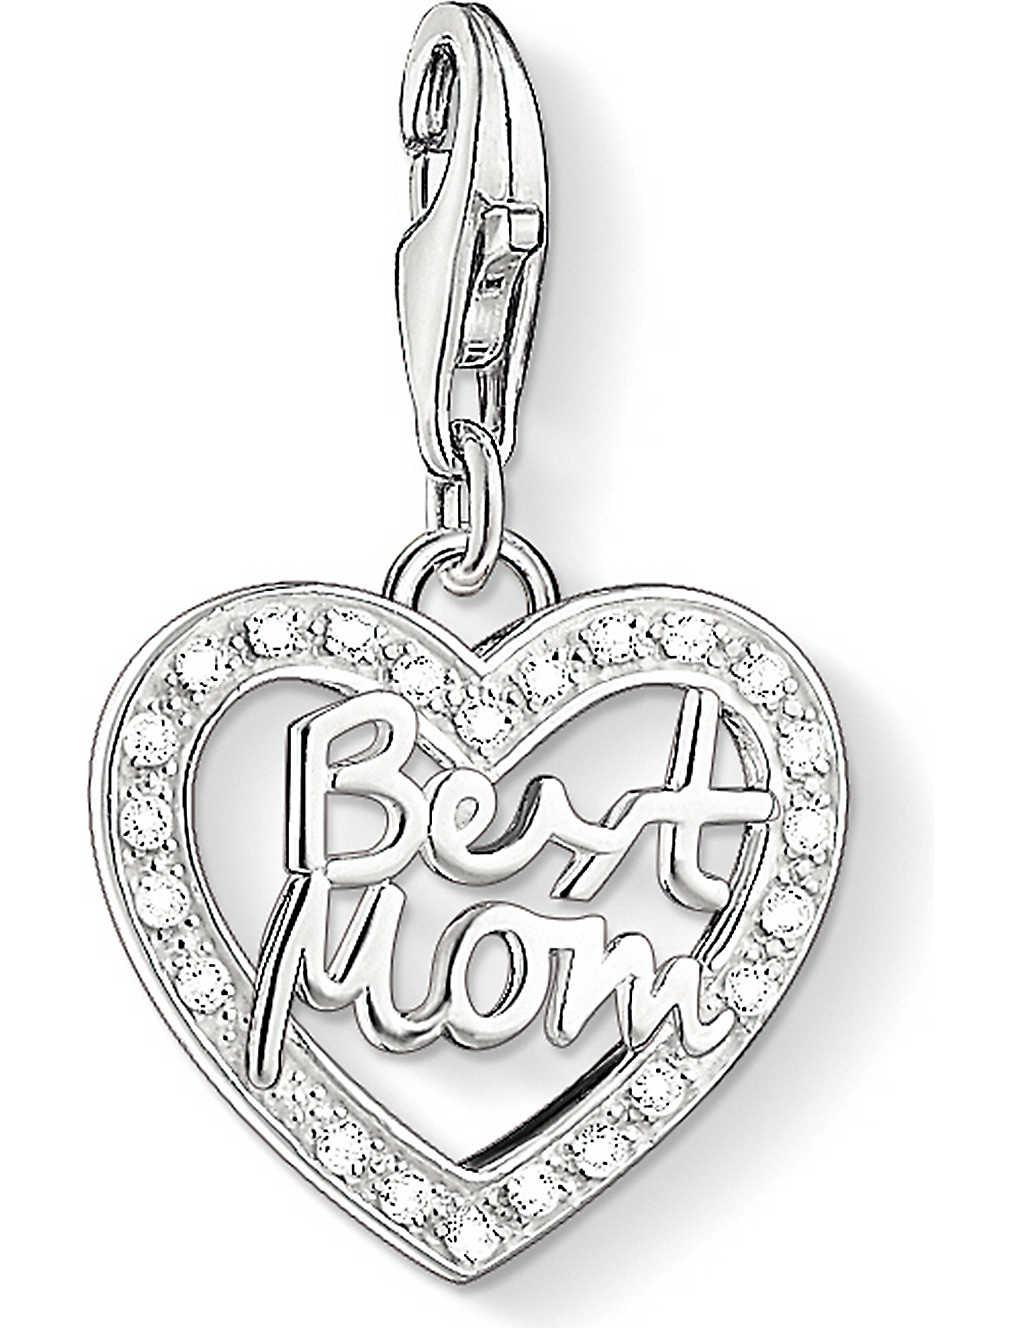 c5deff473a7ed THOMAS SABO - Charm club silver and zirconia best mom charm pendant ...